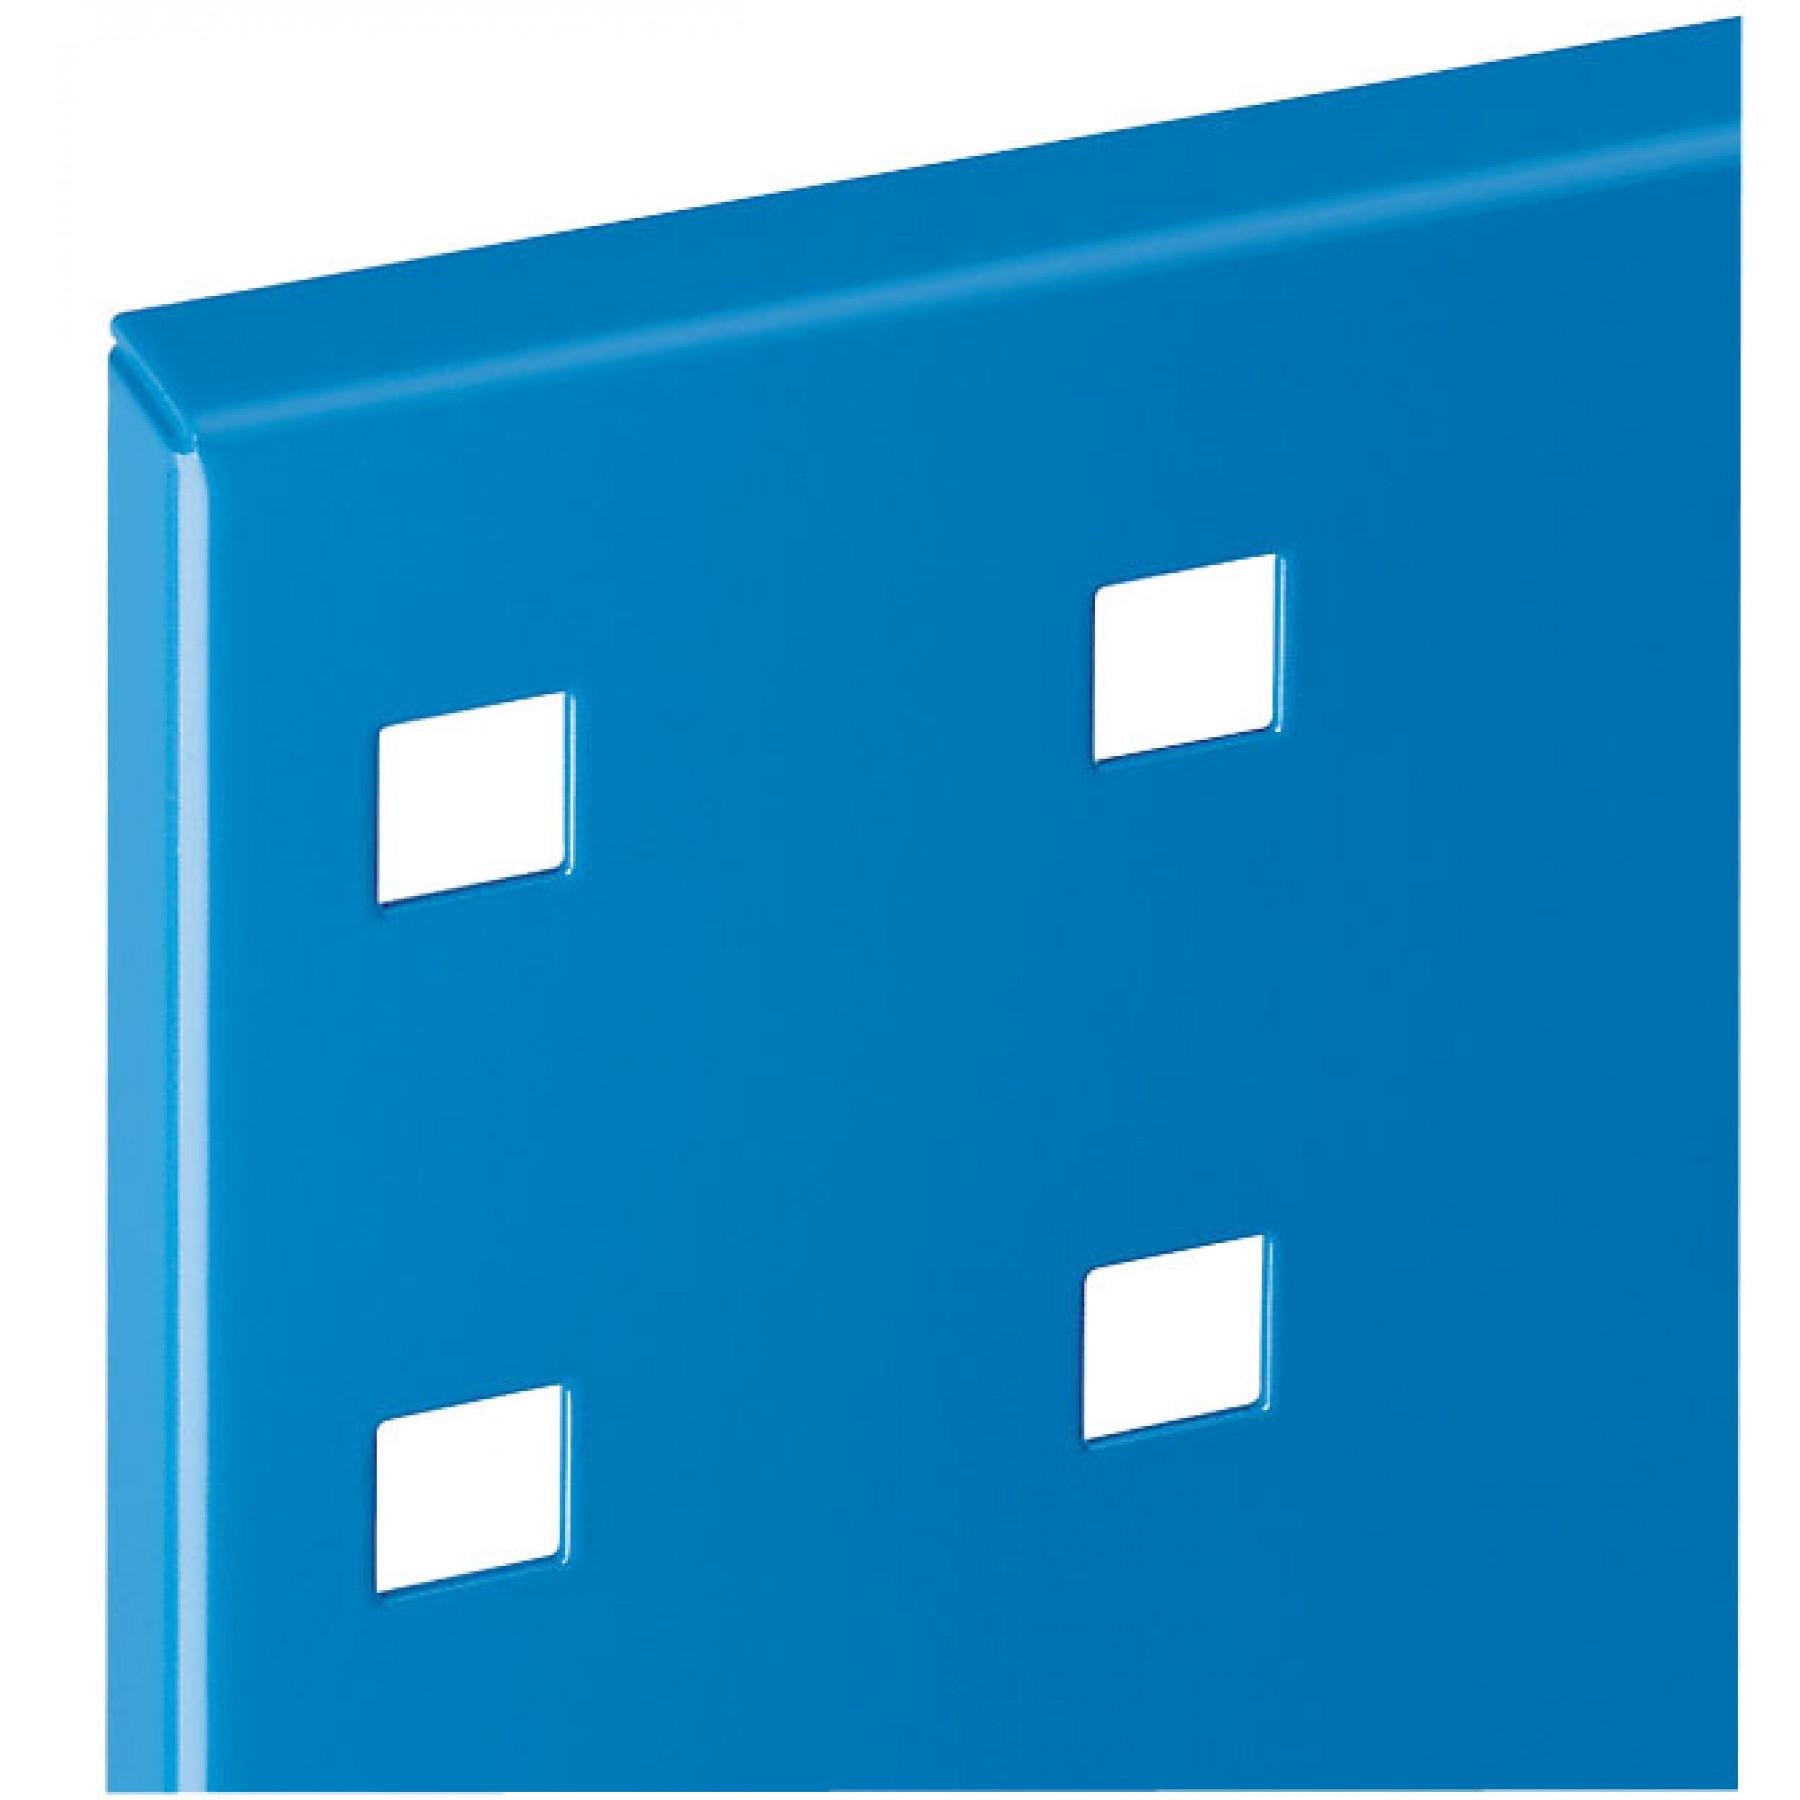 ®RasterPlan perfopaneel-1500x450 mm-RAL 5015 hemelsblauw